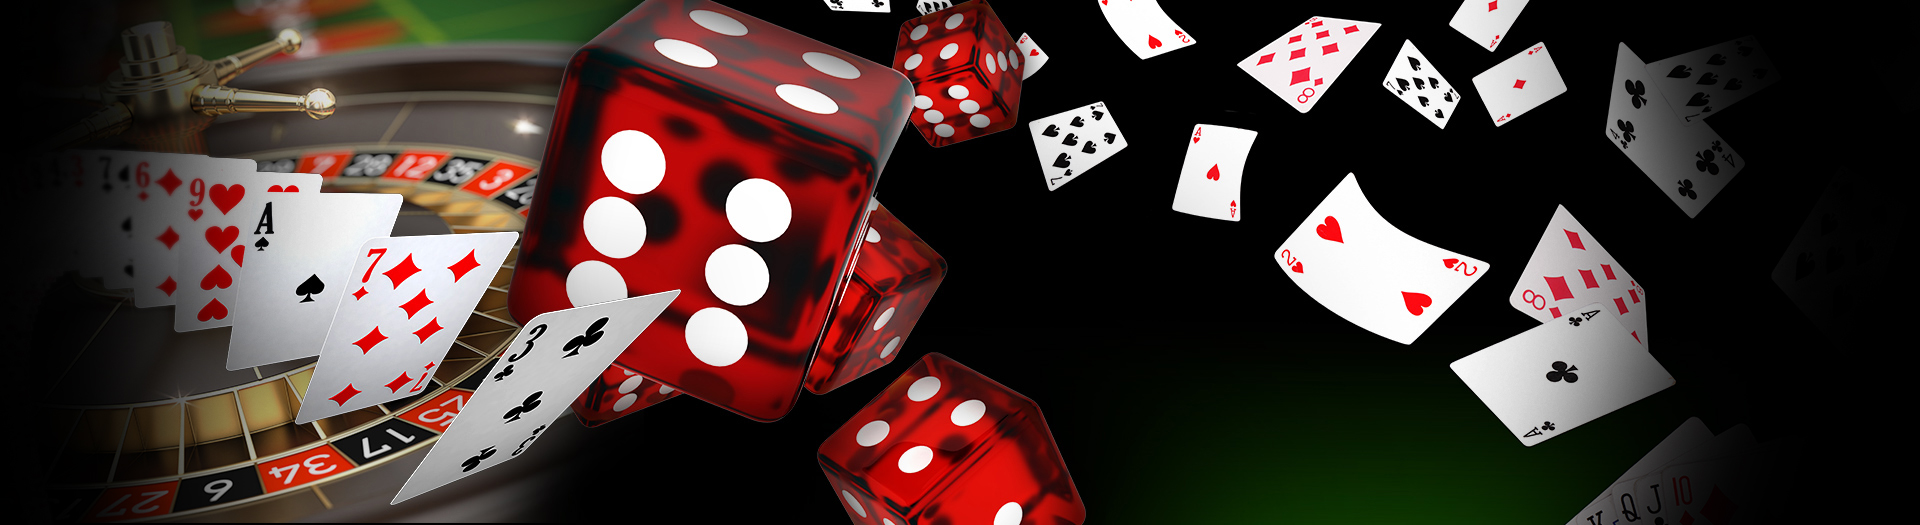 Casino des Monats 620822